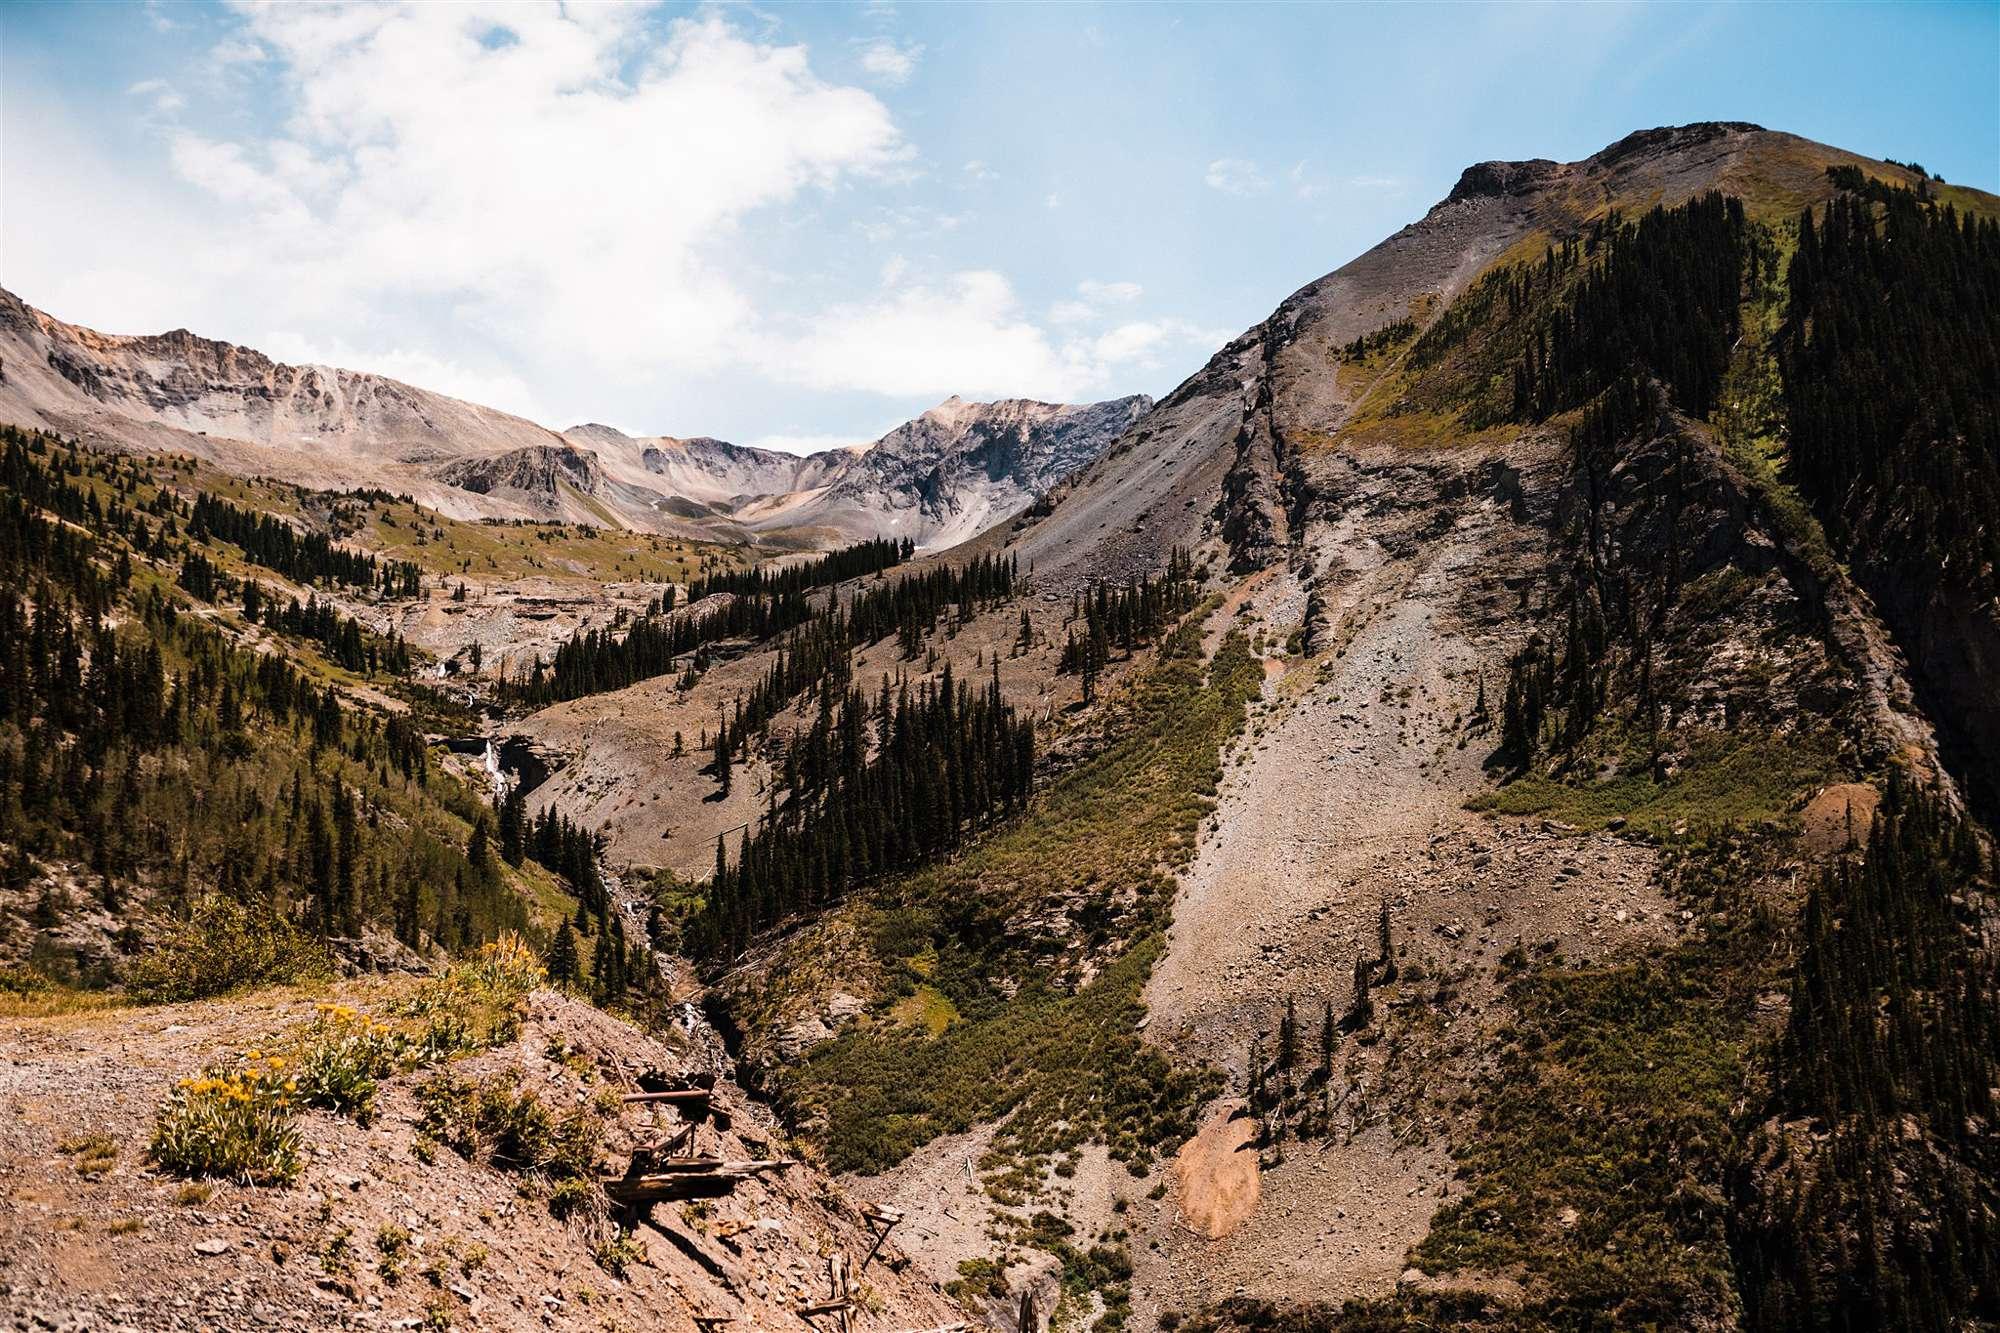 Colorado_Jeeping_Elopement_Emily_Matt_The_Foxes_Photography_0004.jpg